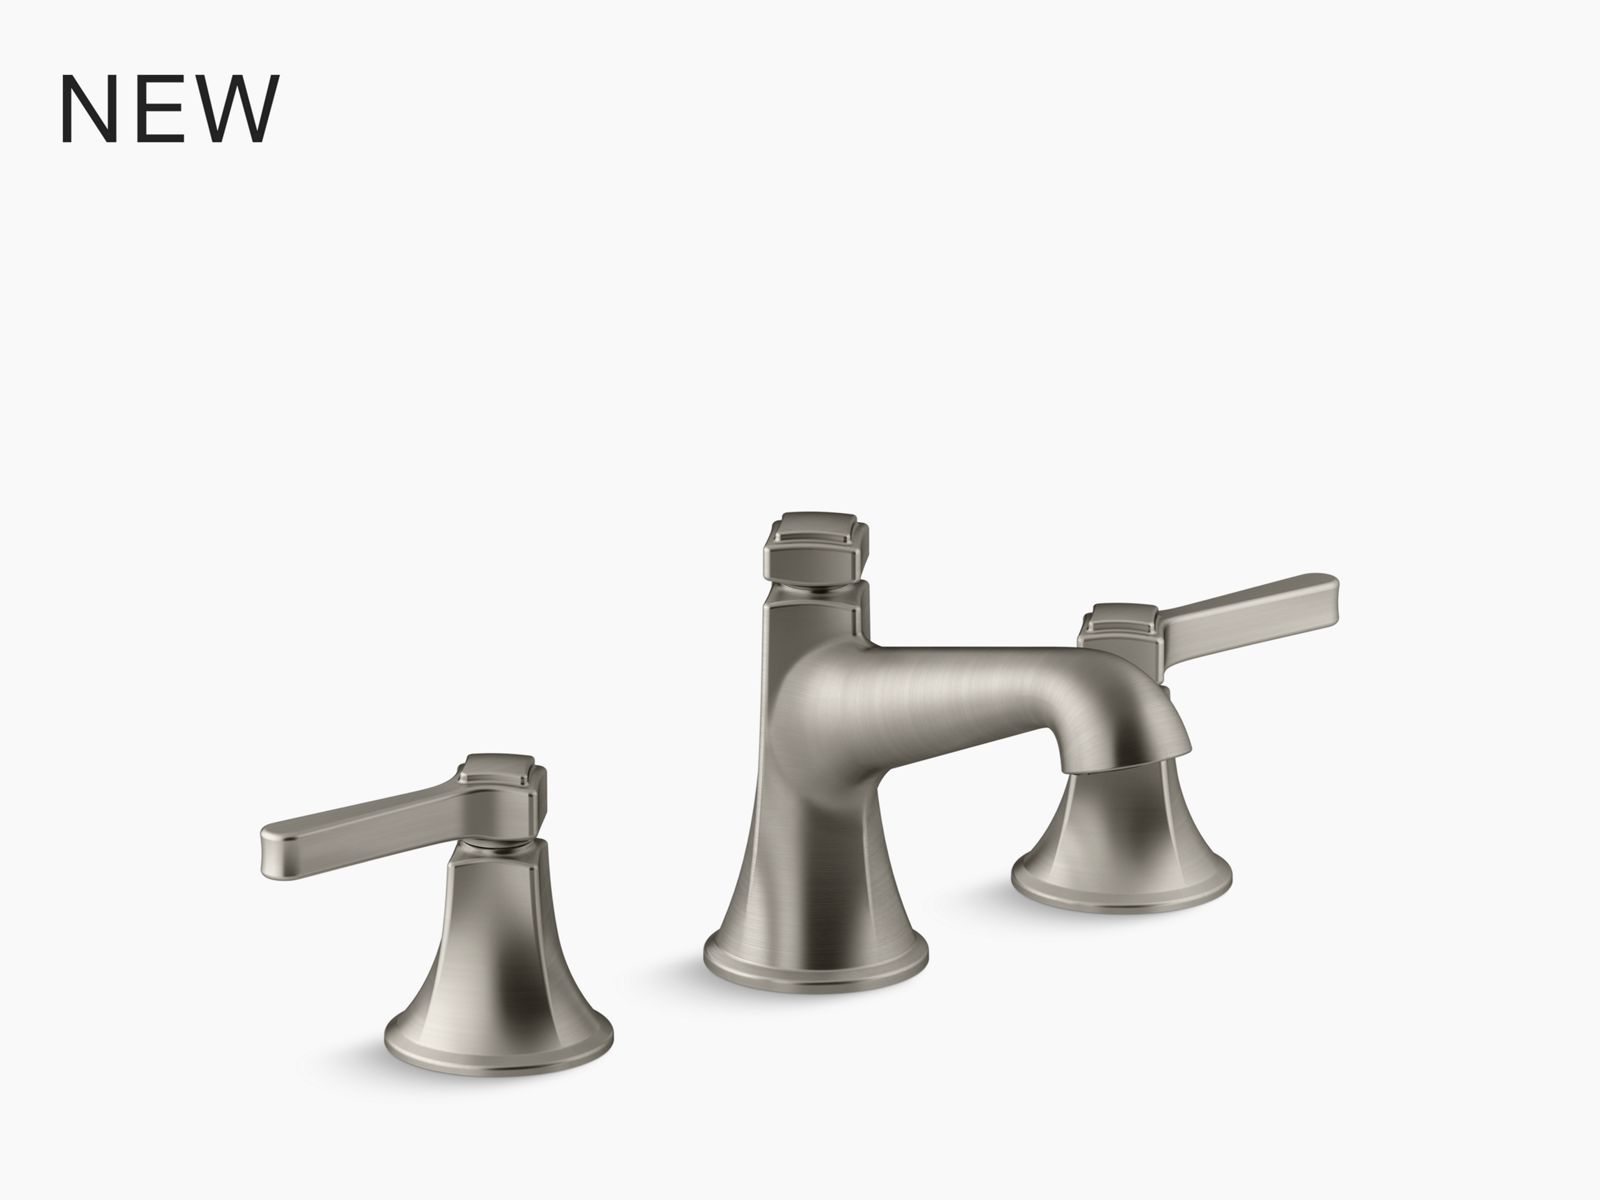 tournant single handle semi professional kitchen sink faucet